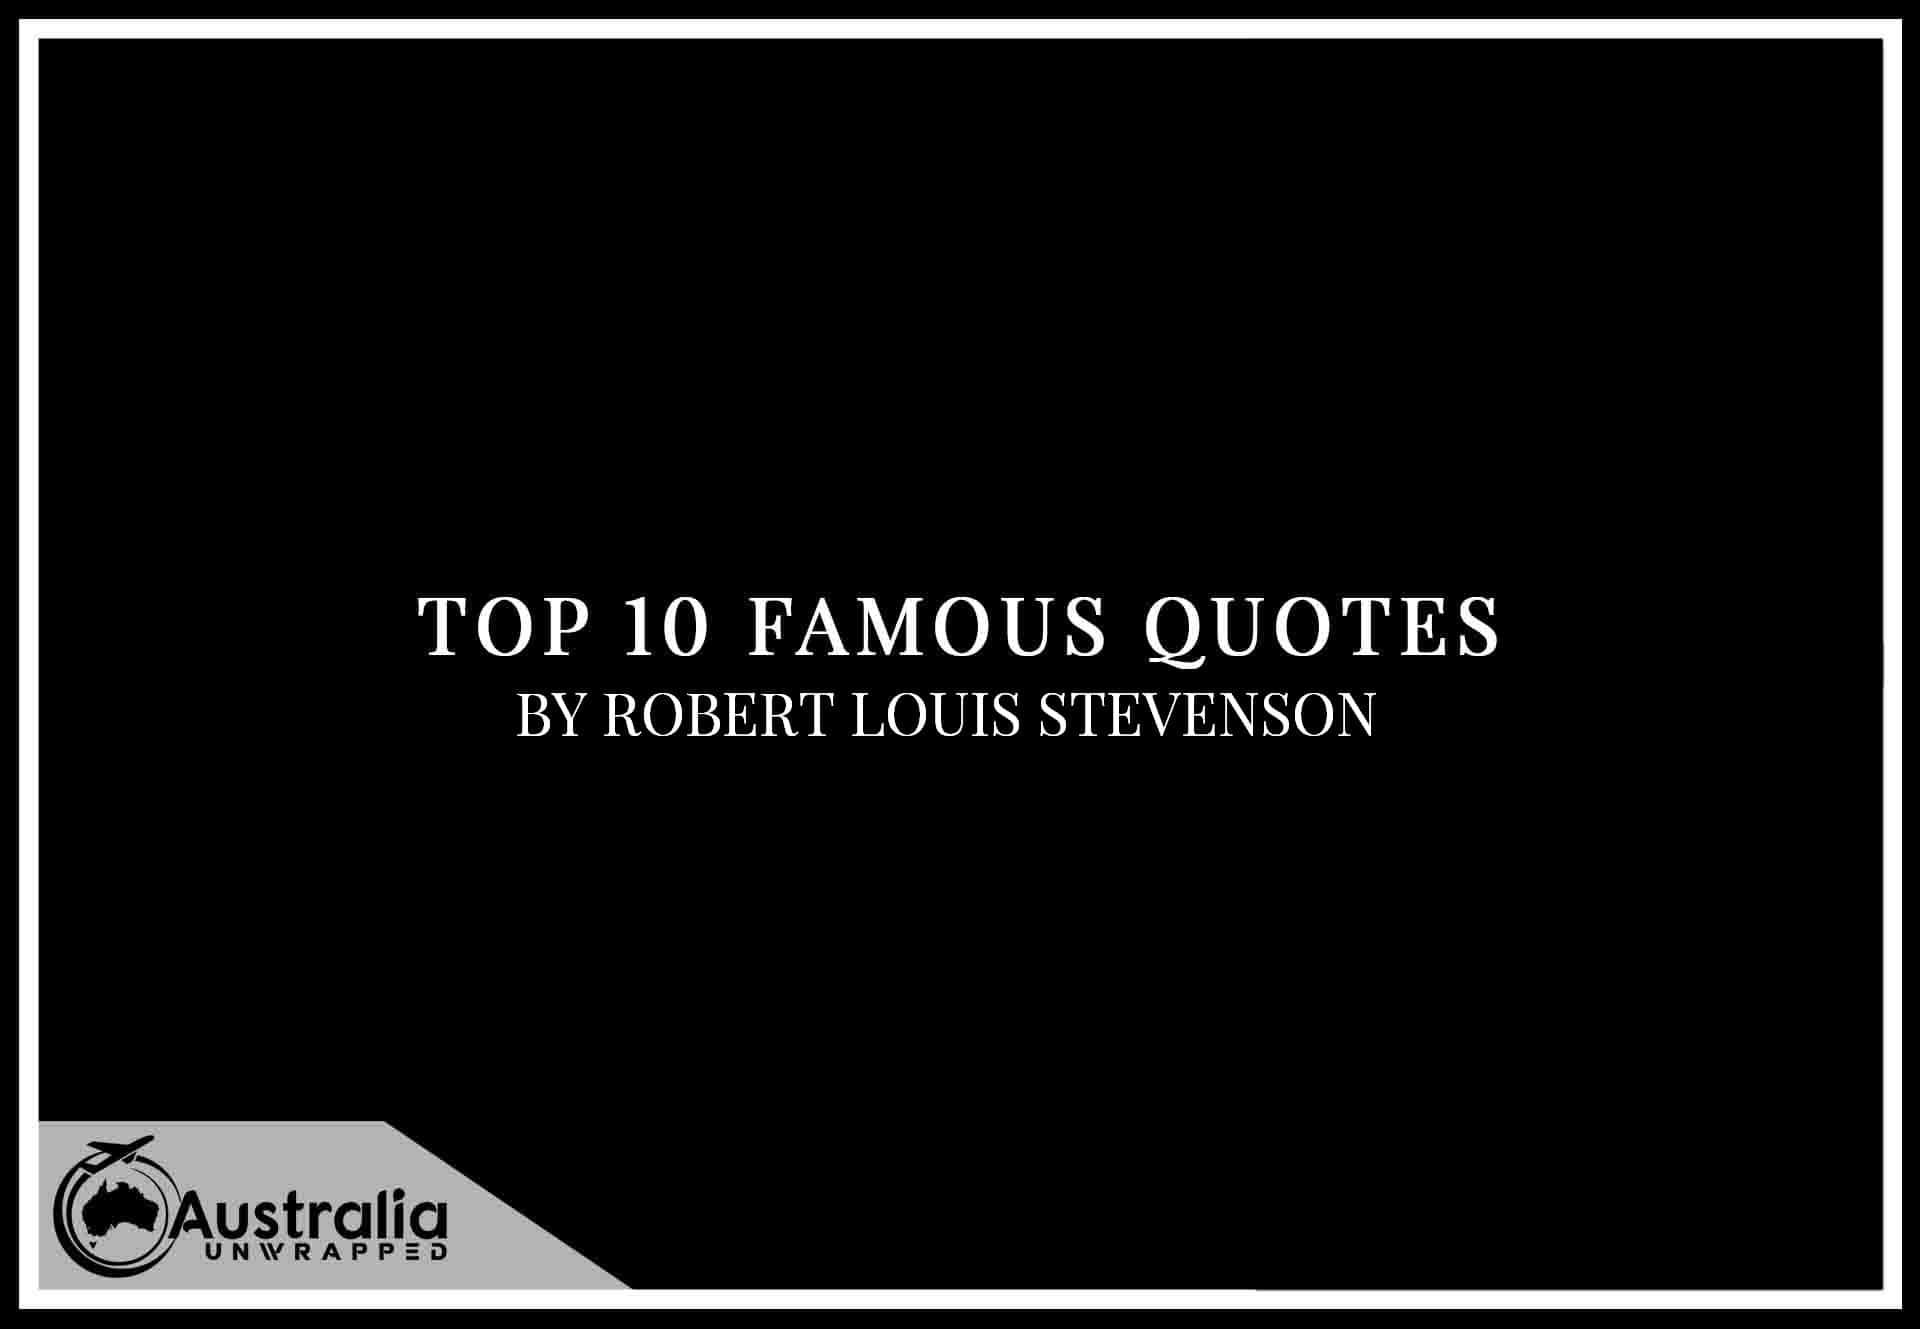 Top 10 Famous Quotes by Author Robert Louis Stevenson